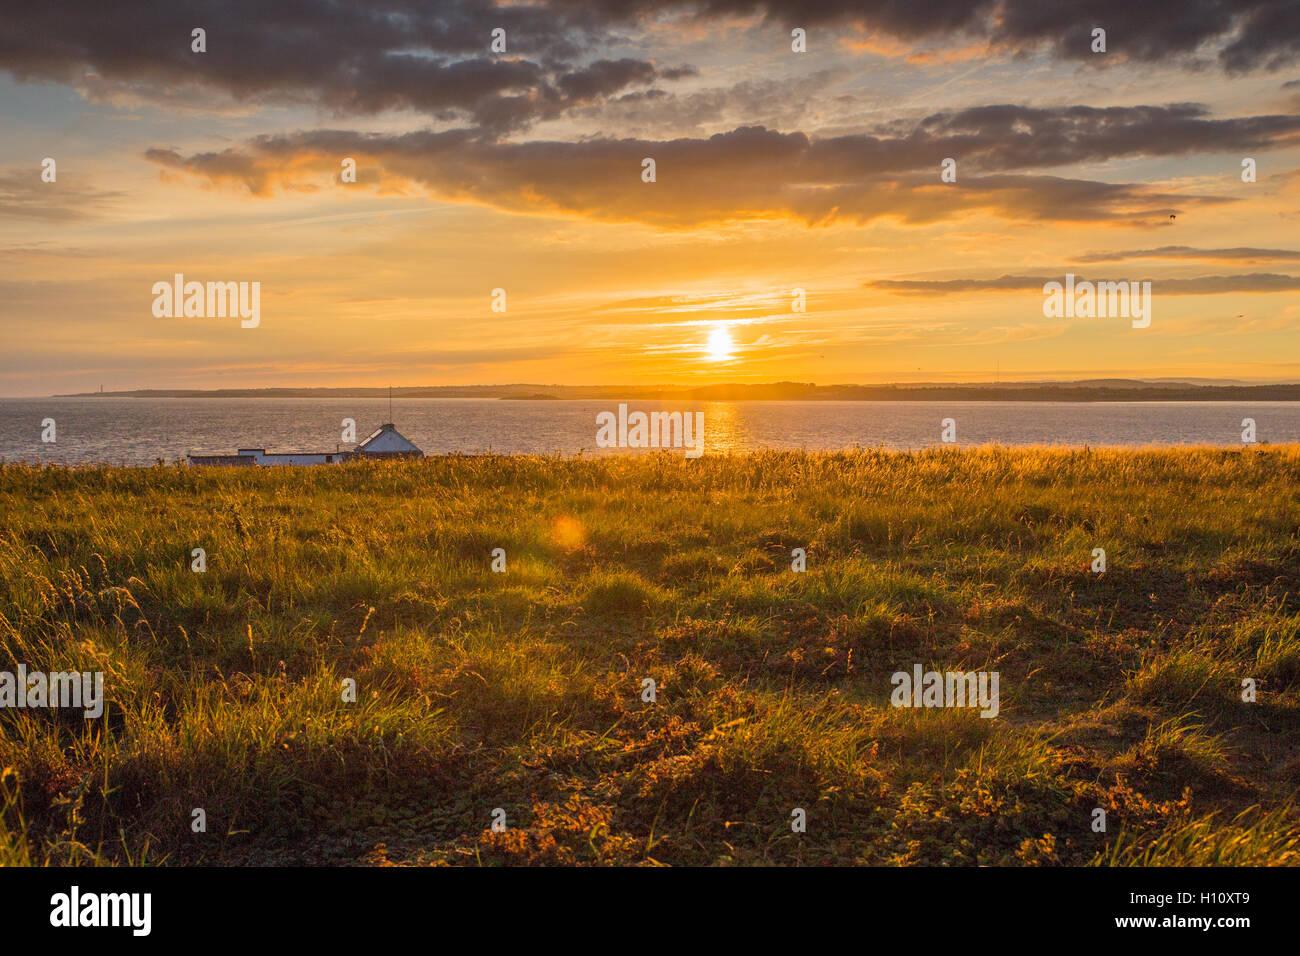 Flat Holm Island Farmhouse at sunset. - Stock Image